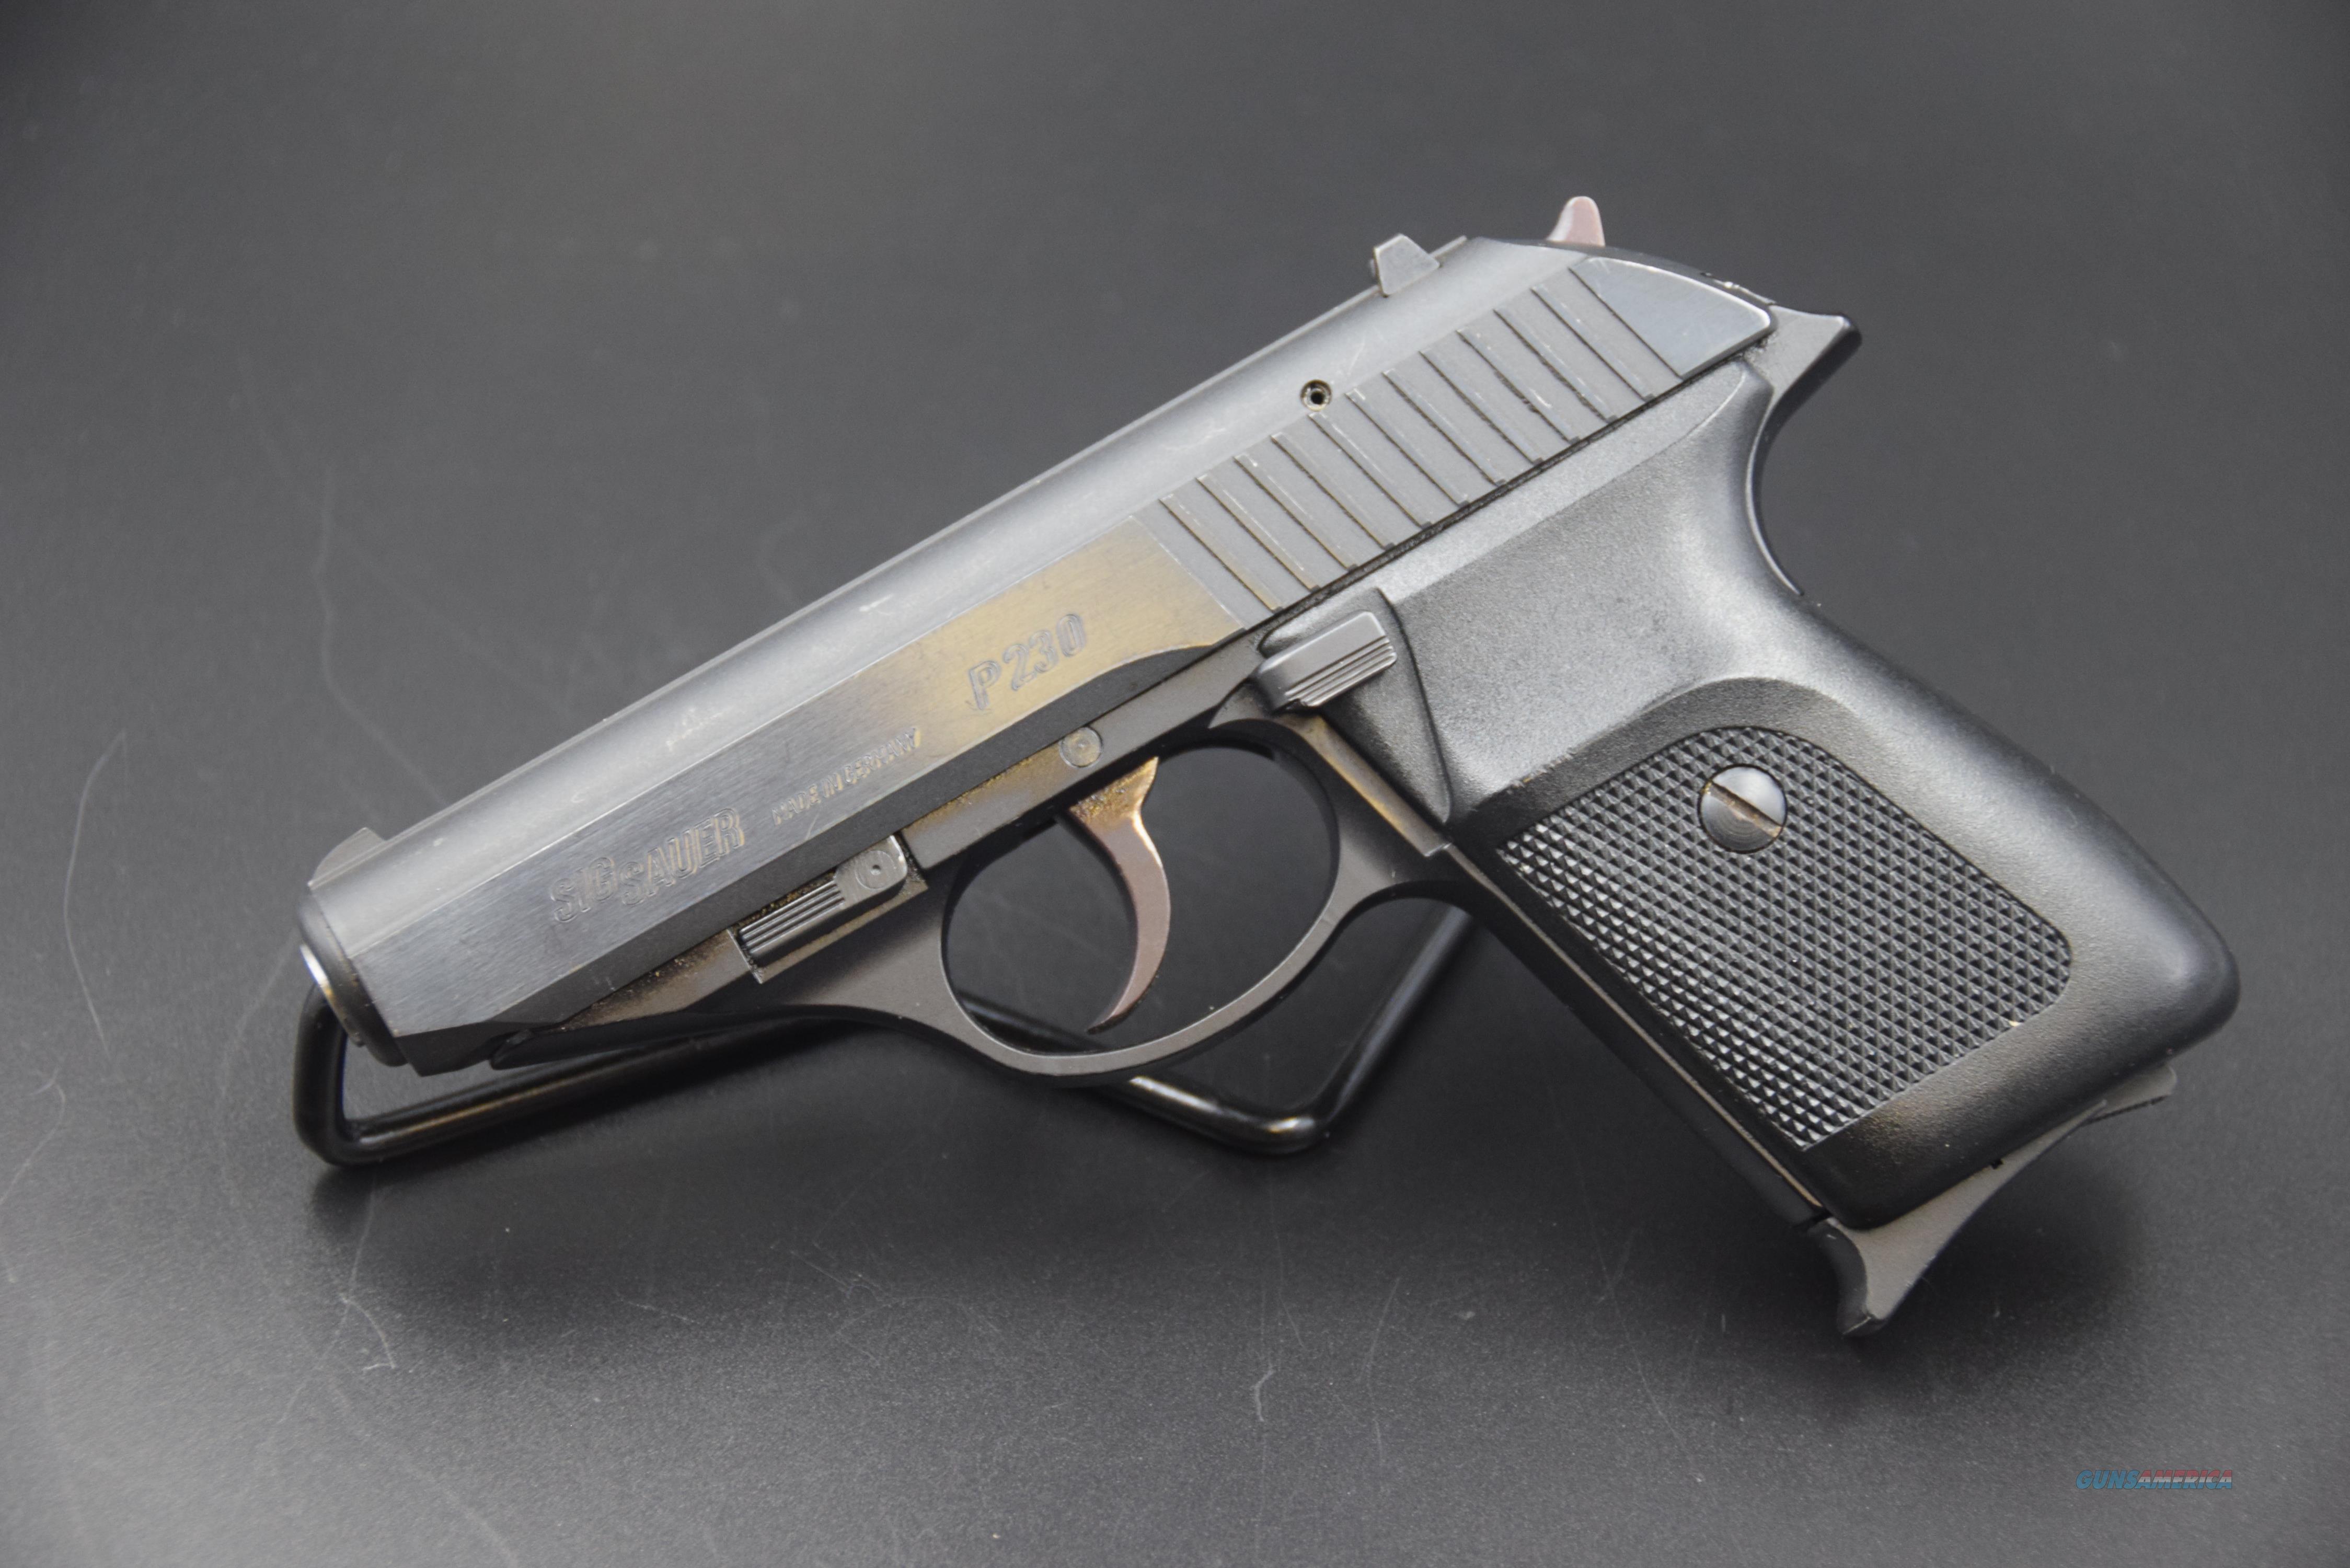 SIG SAUER P-230 LIGHTWEIGHT .380 ACP PISTOL  Guns > Pistols > Sig - Sauer/Sigarms Pistols > P230